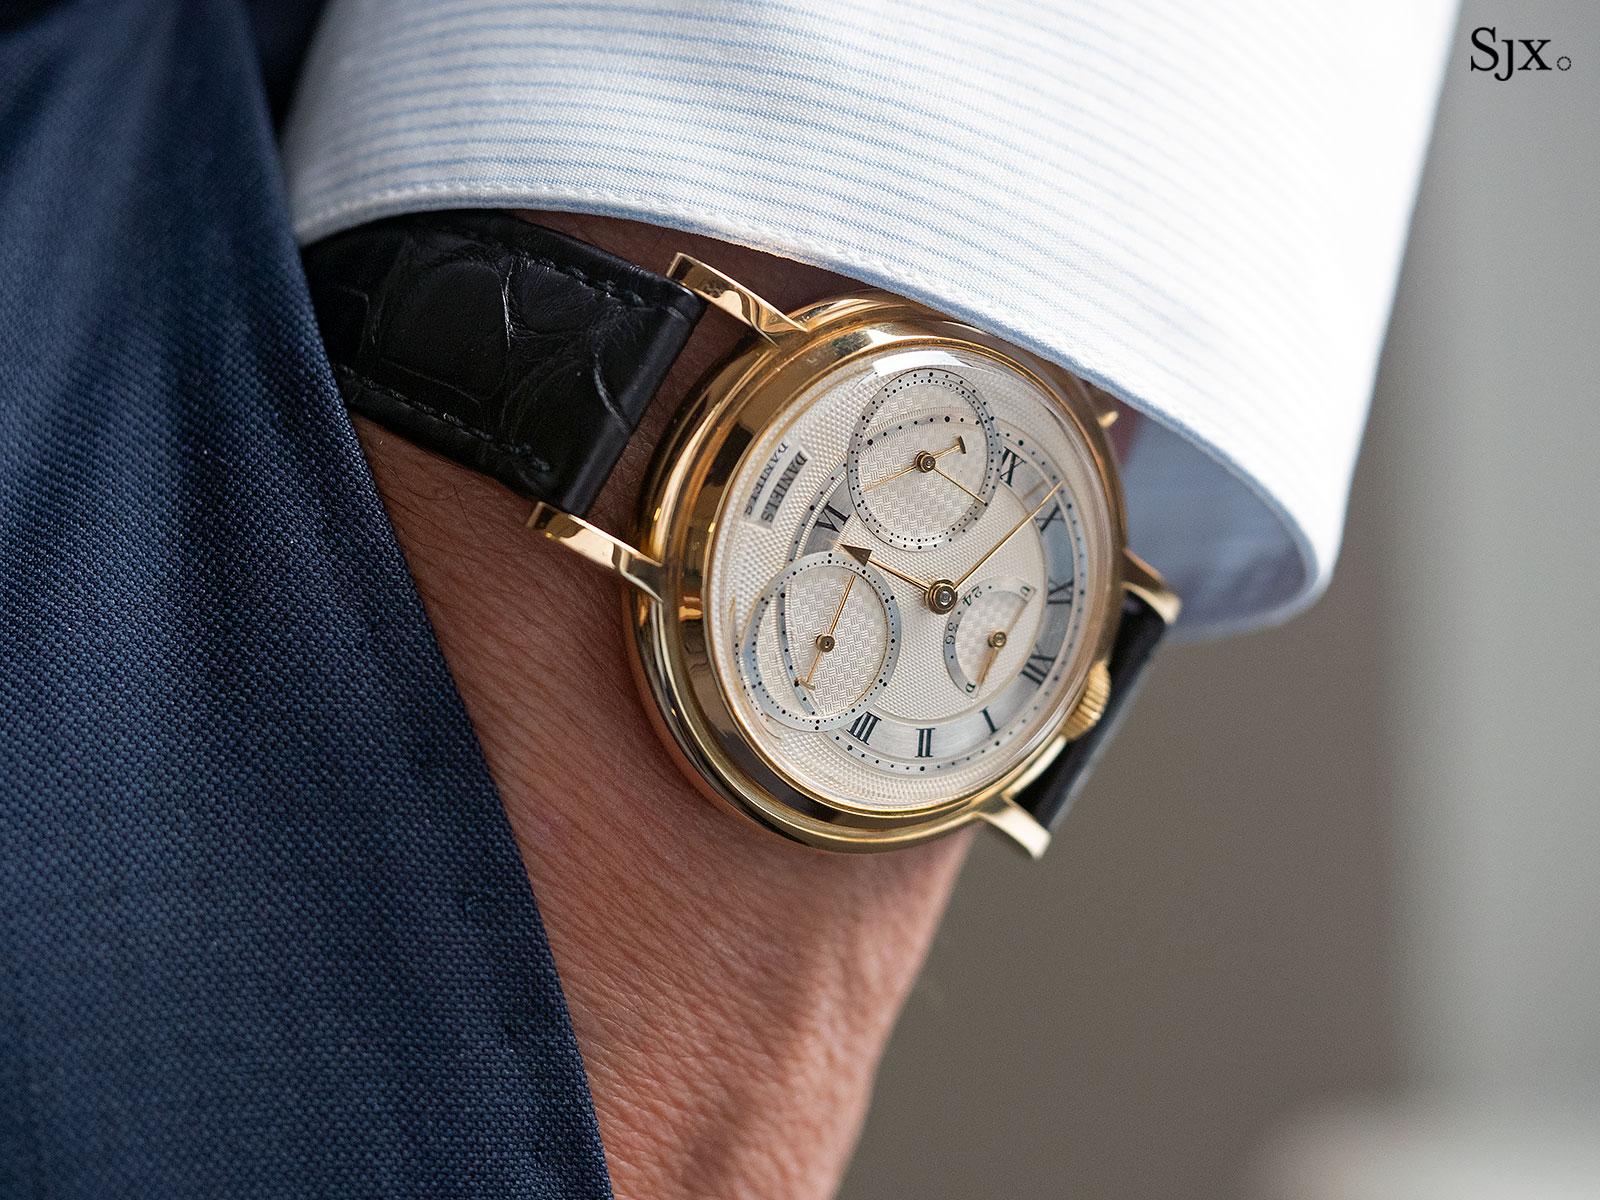 George Daniels Chronograph Wristwatch with tourbillon 24